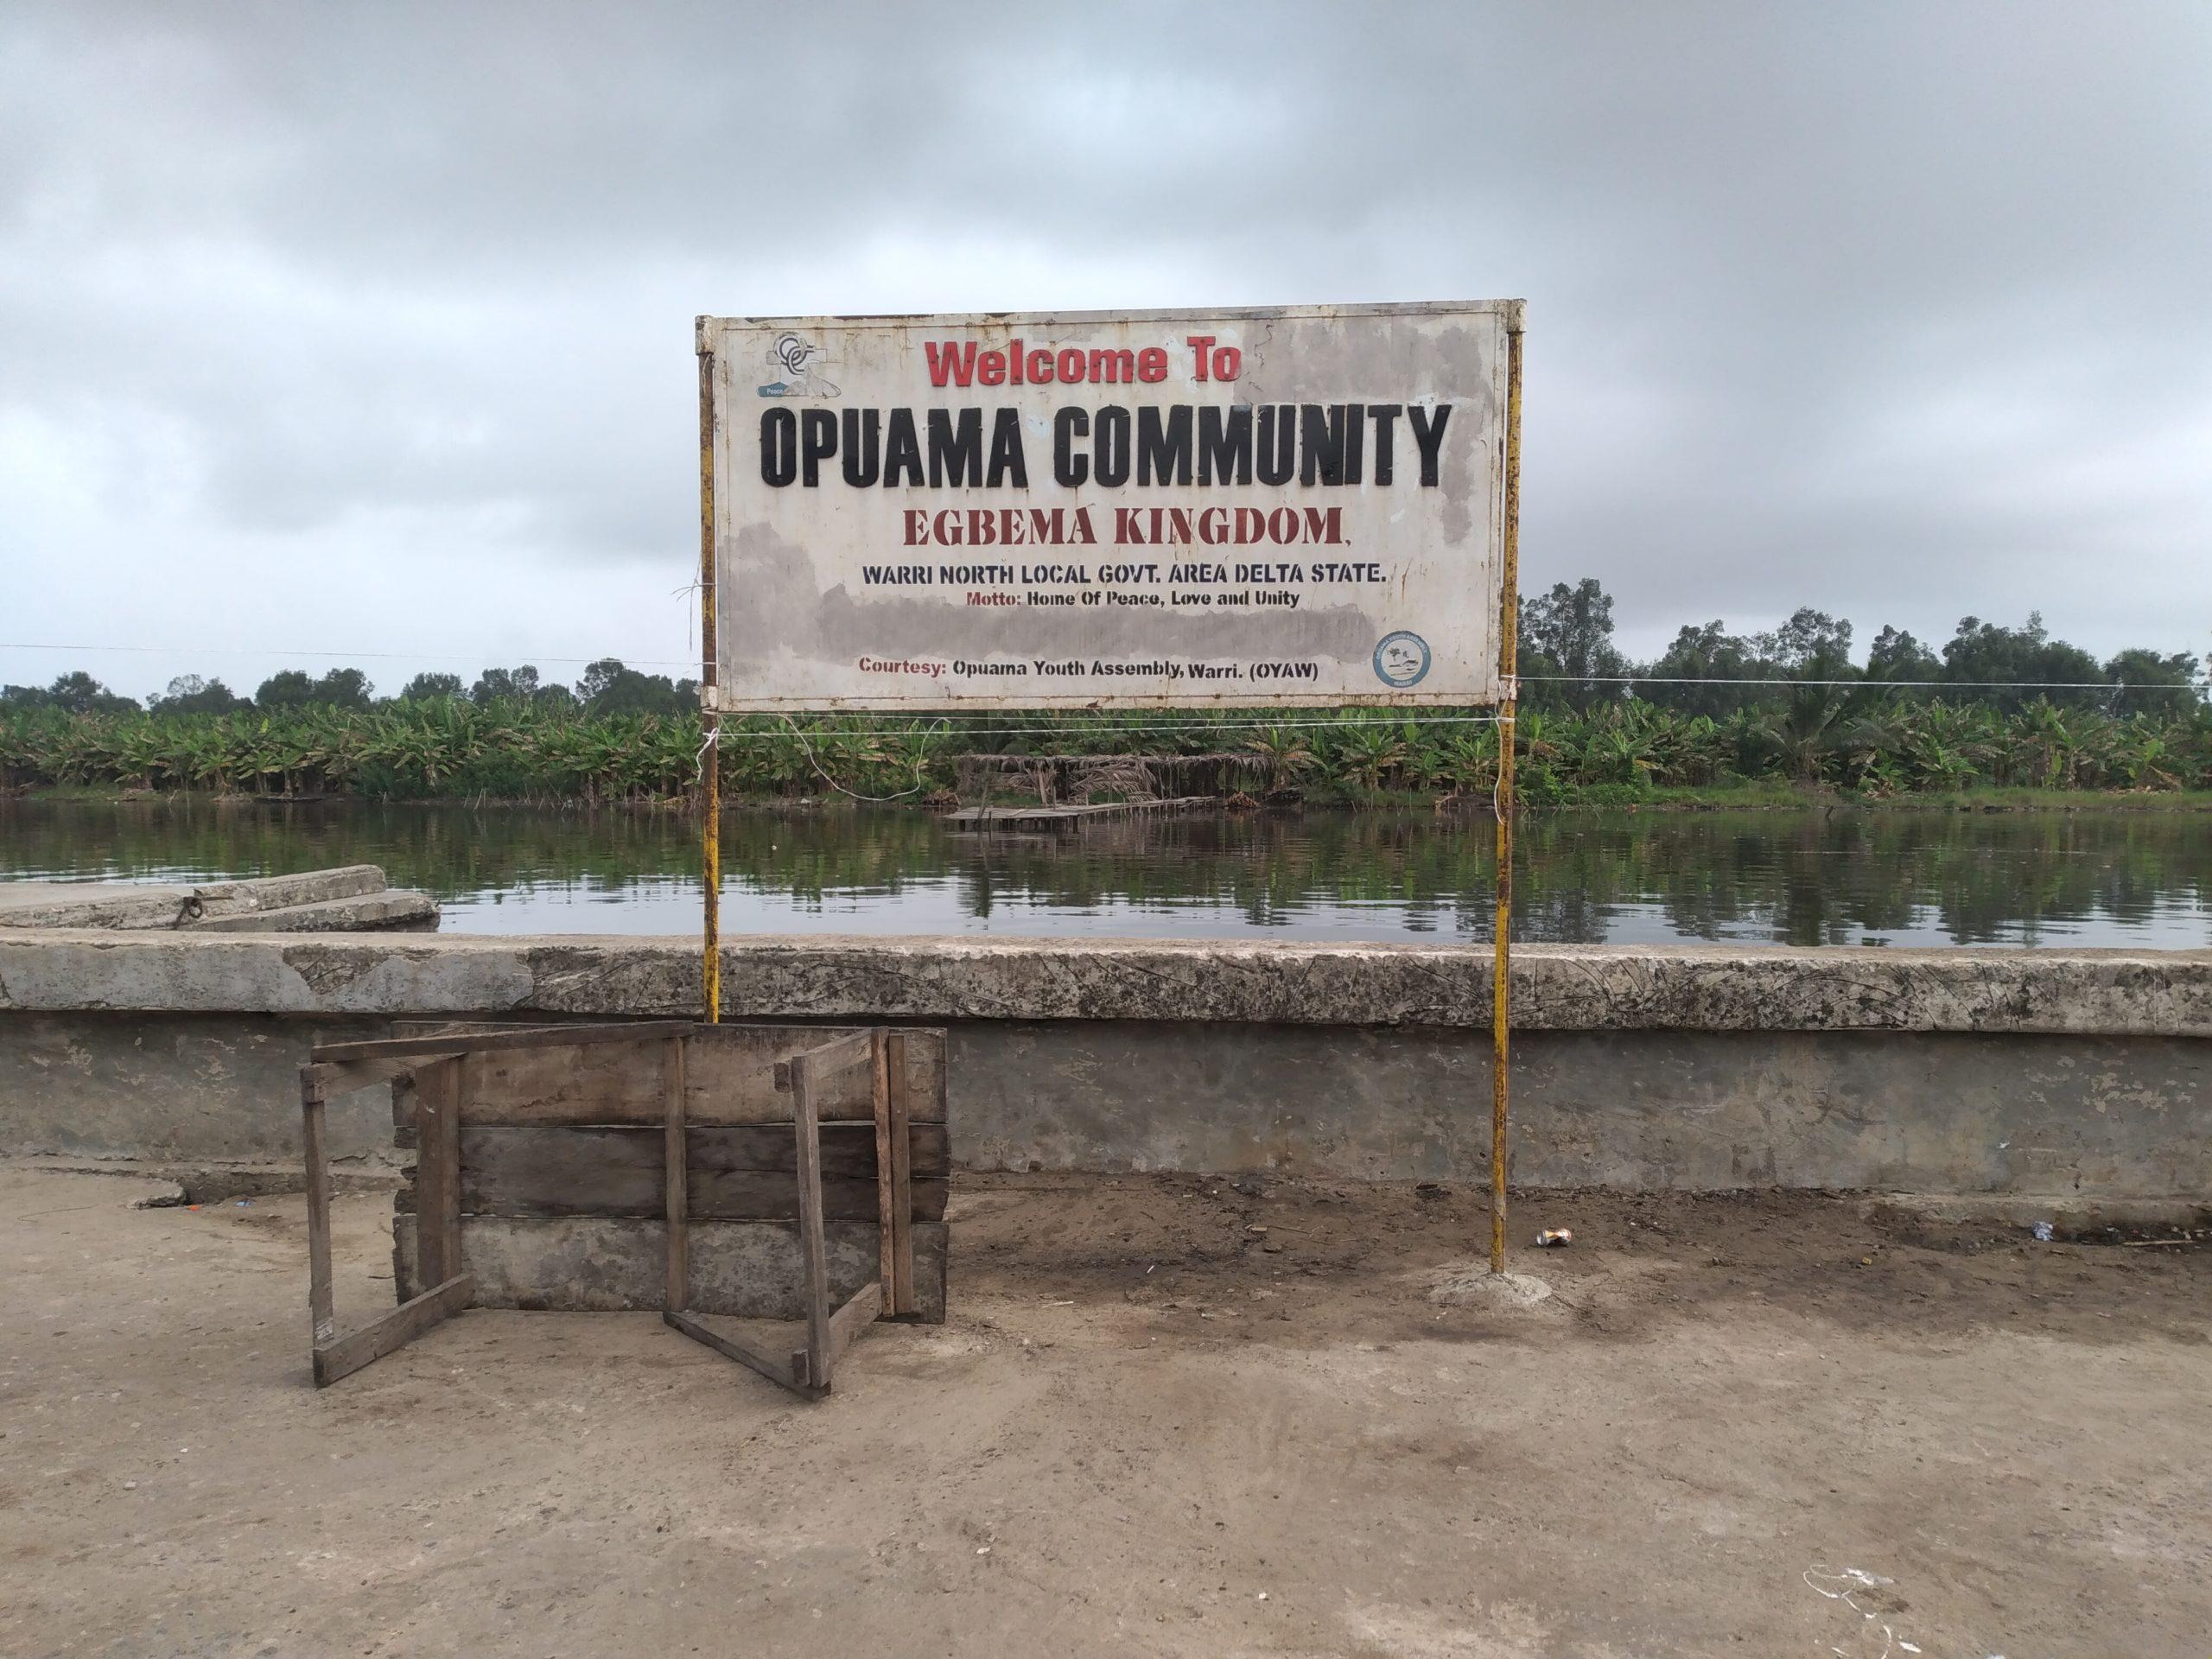 A signboard in Opuama